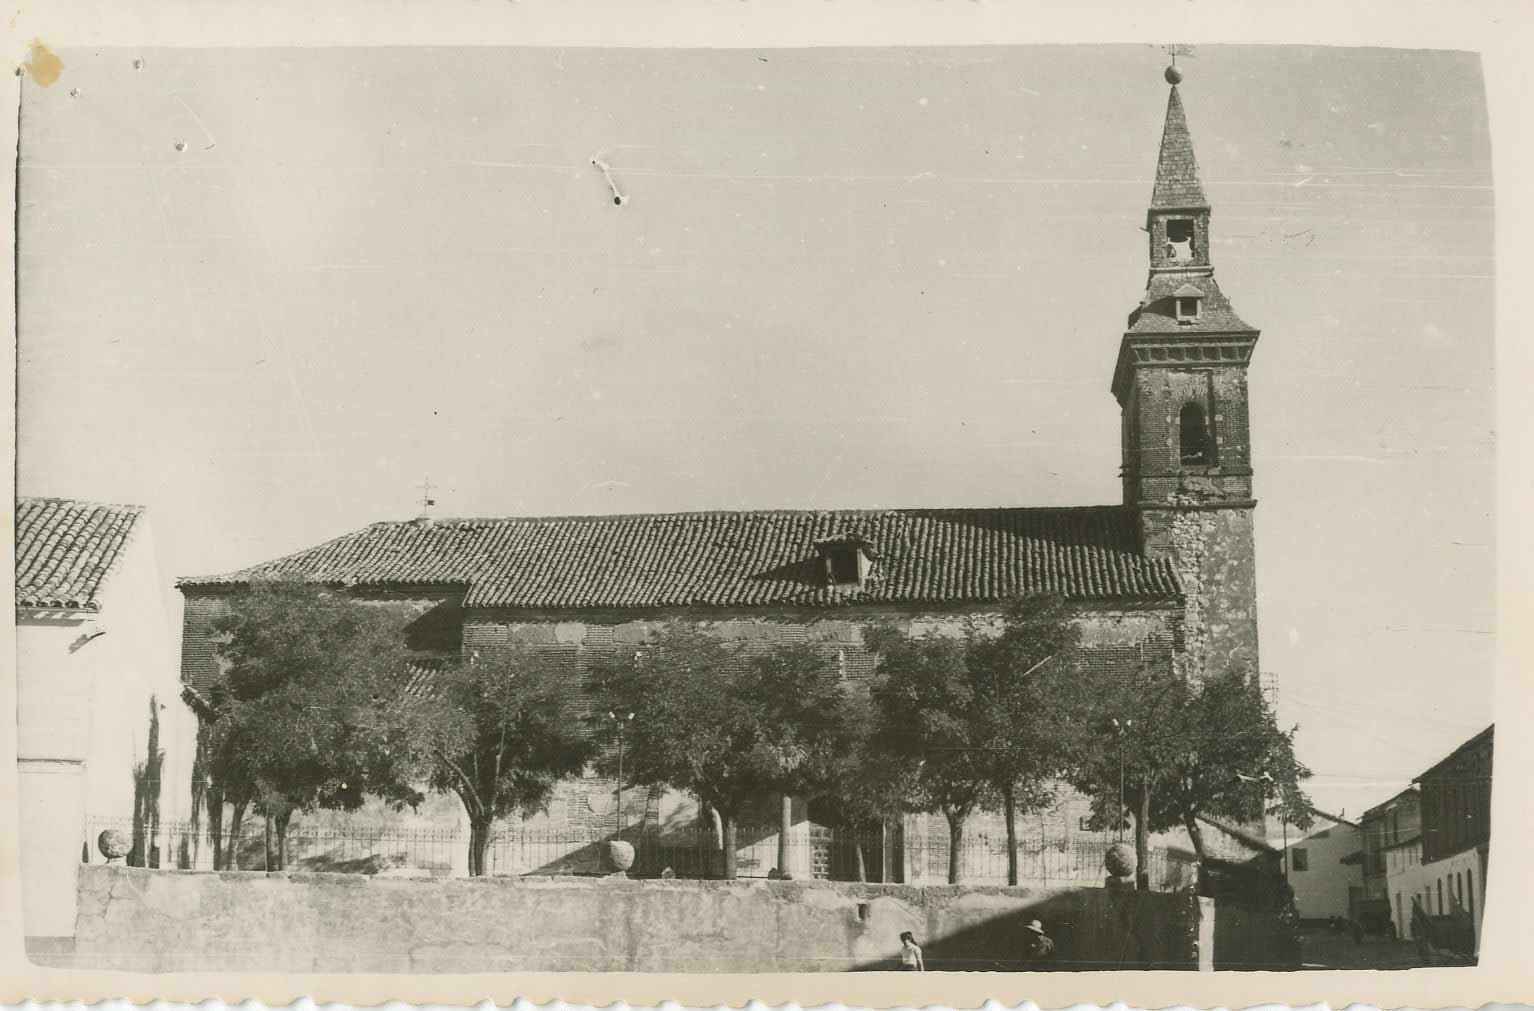 Portillo de Toledo. Iglesia Ntra. Sra. de la Paz.1960 (P-745